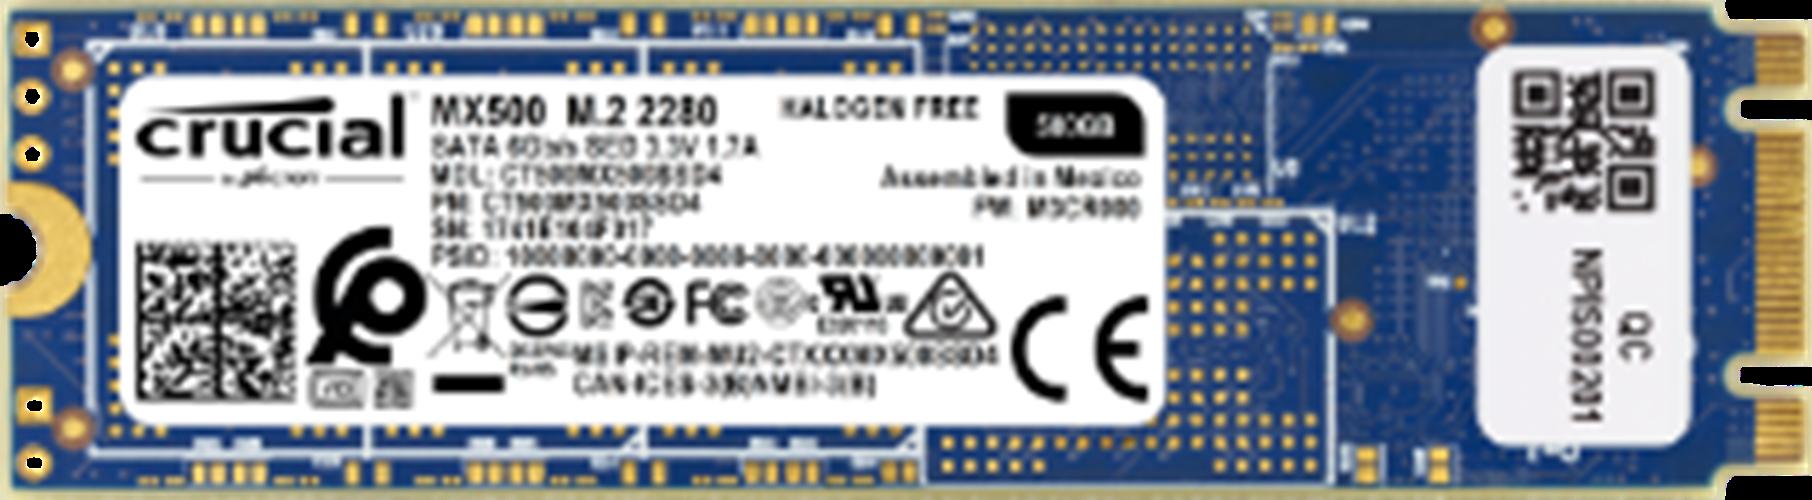 דיסק CRUCIAL MX500 SSD 500GB M2 2280 CT500MX500SSD4